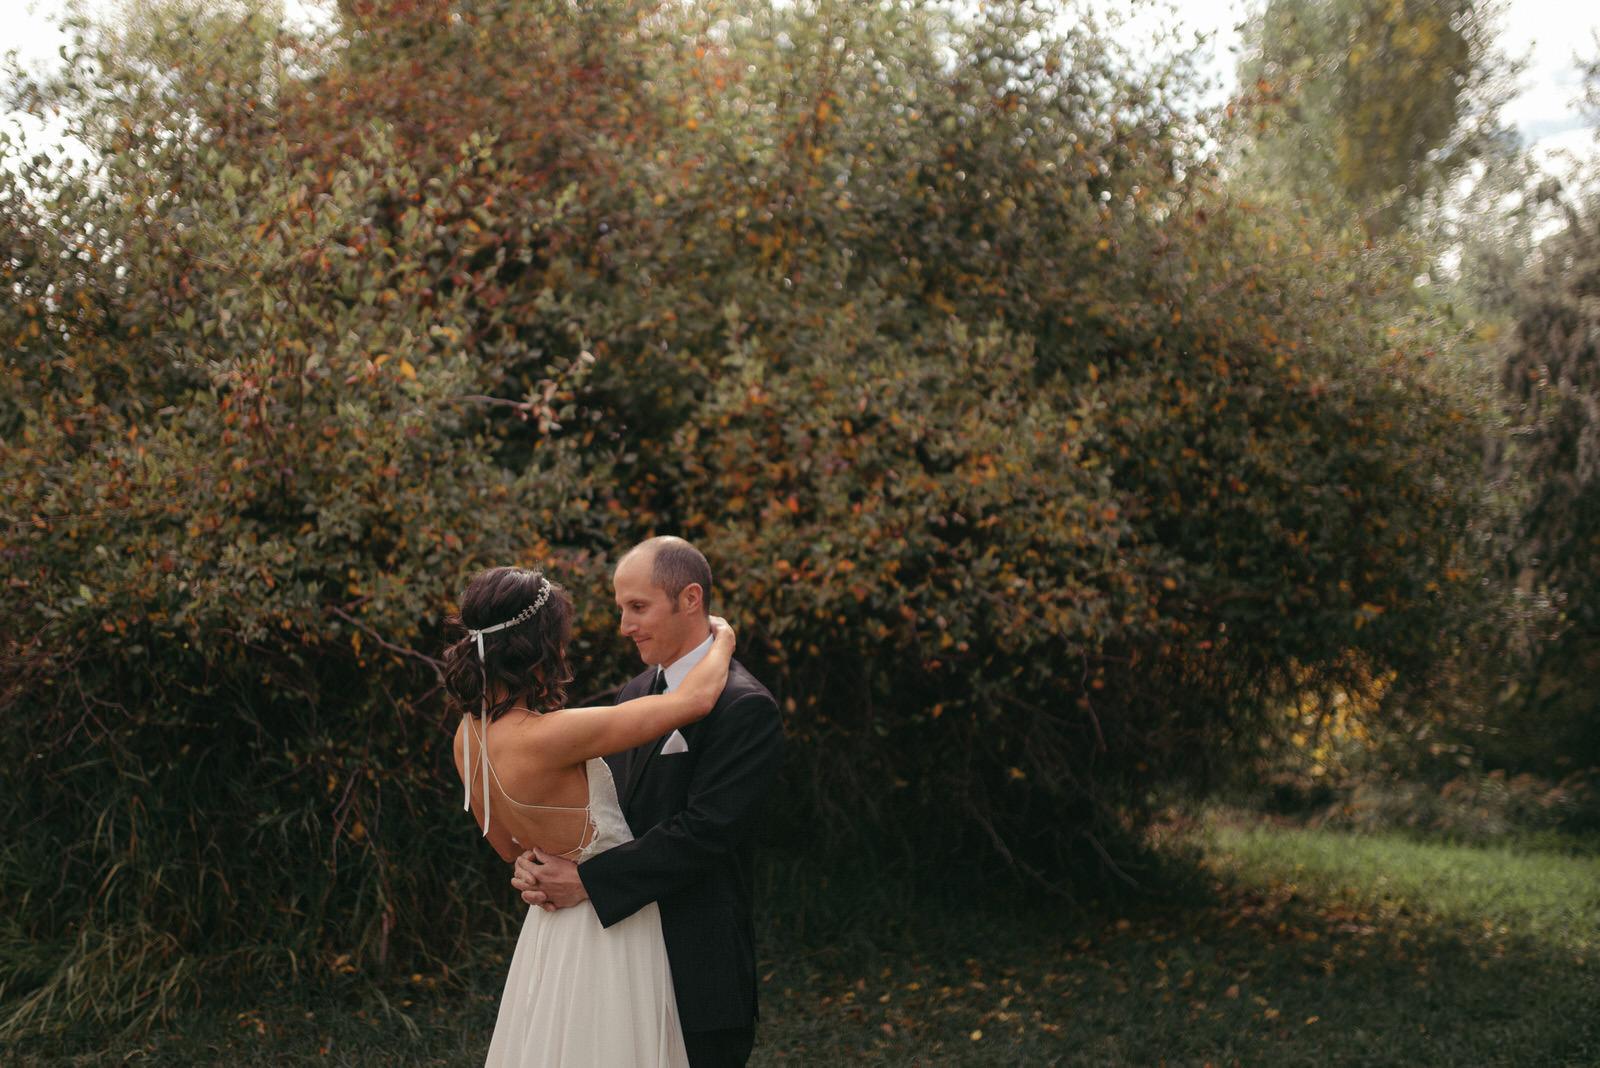 Kyle + Megan First Look, Wyoming Wedding